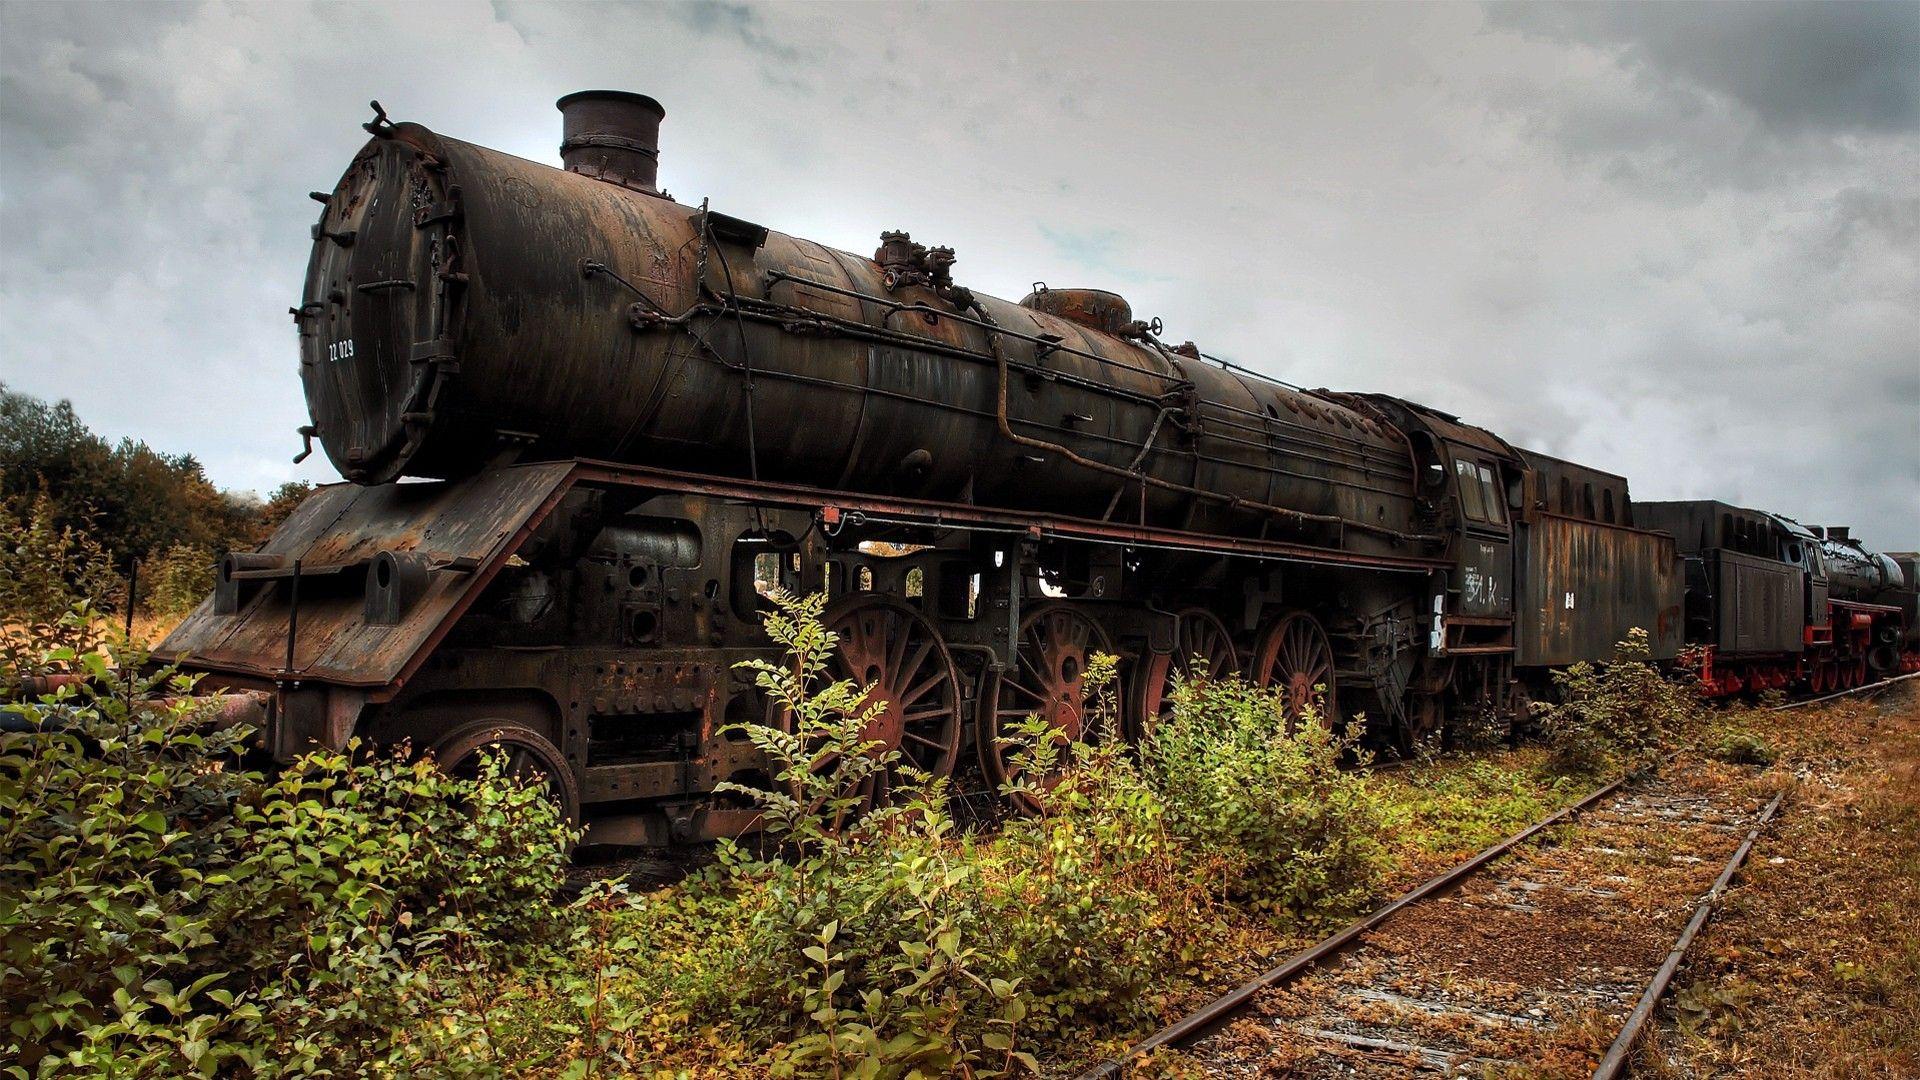 rusted train Train wallpaper, Abandoned train, Train